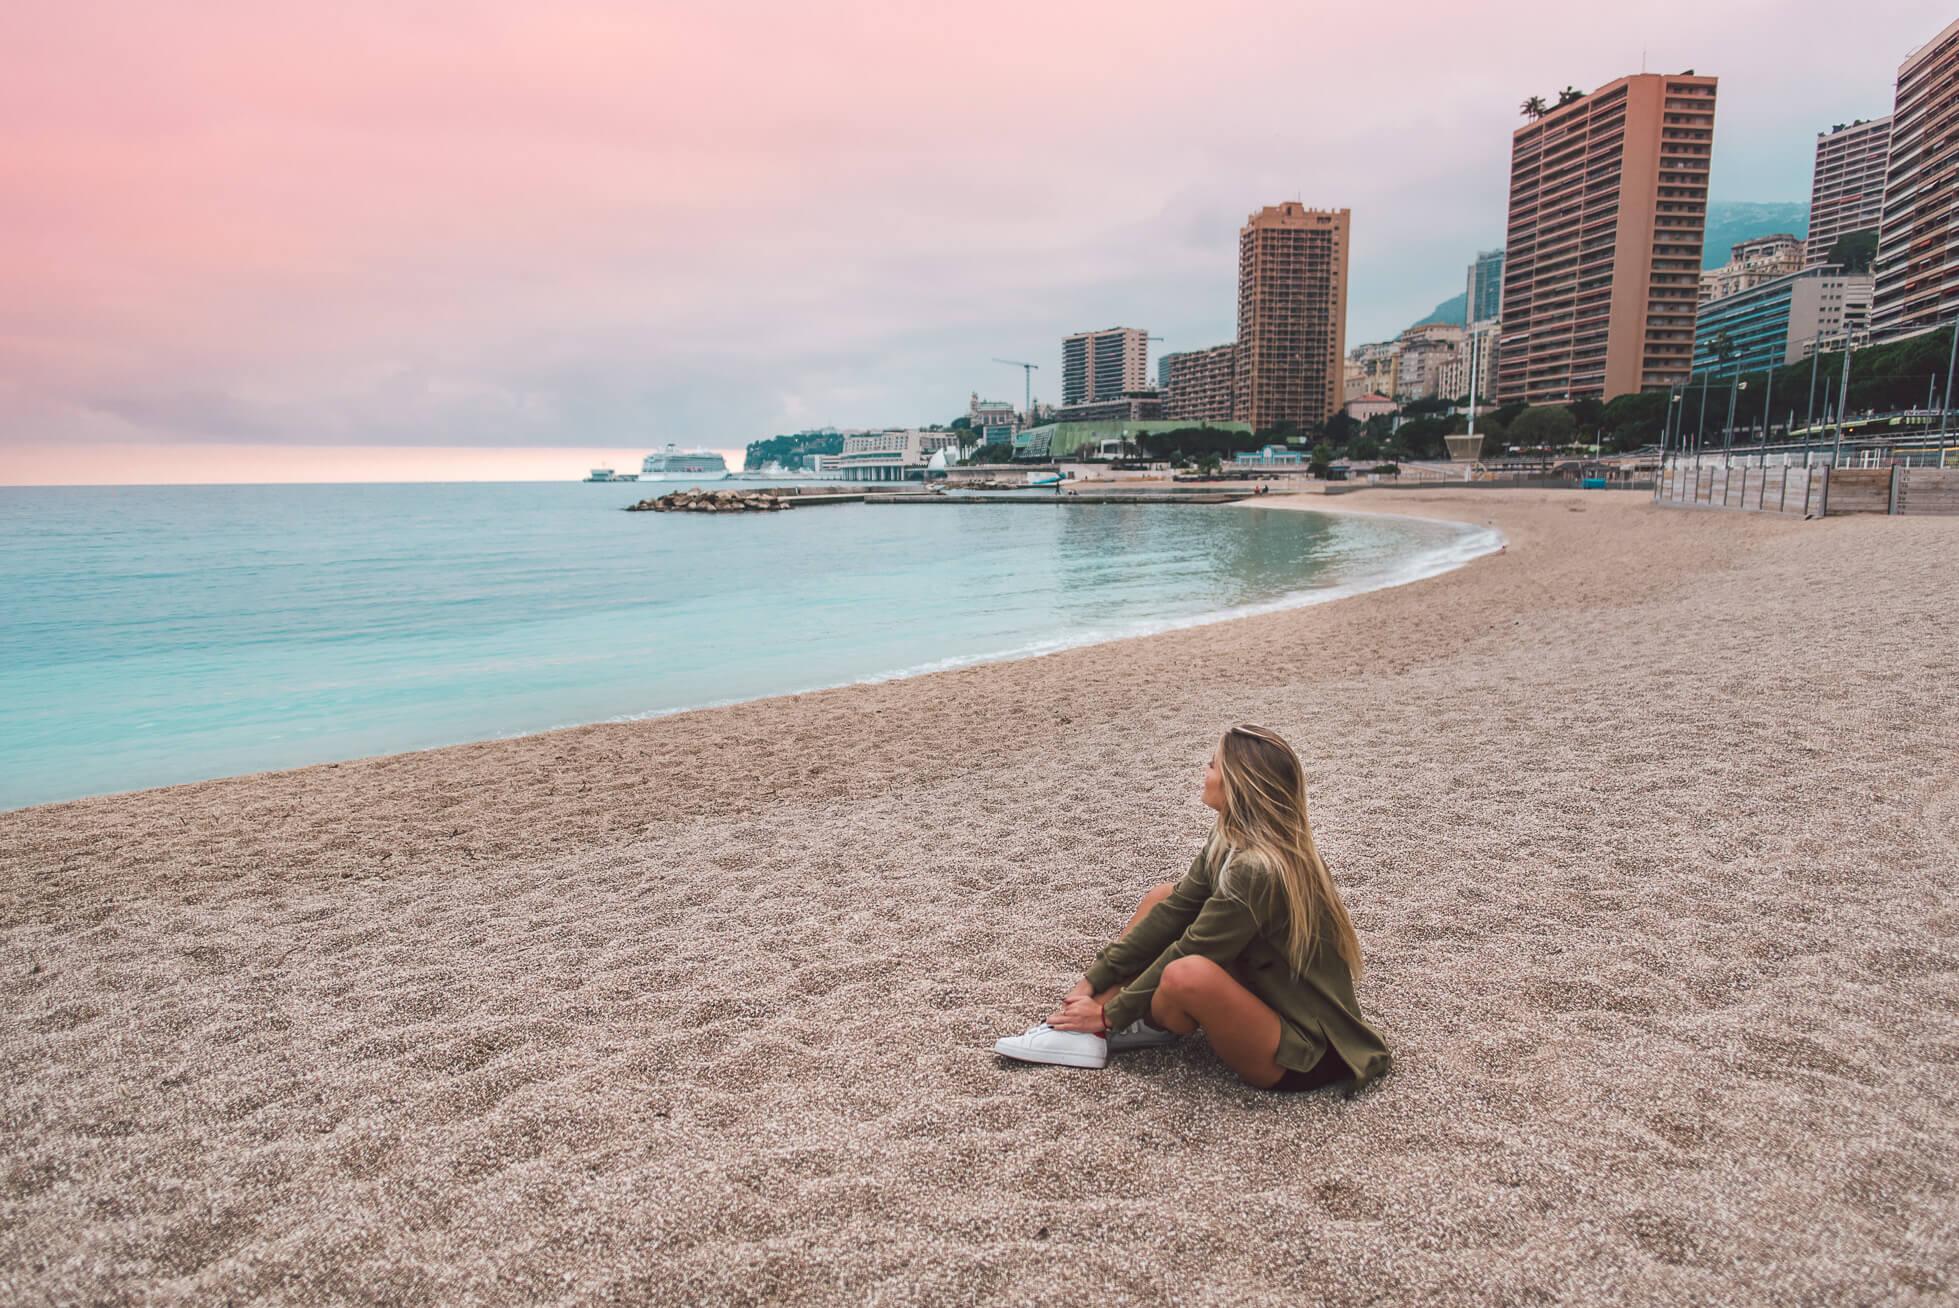 janni-deler-beachy-moment-sunsetDSC_6985